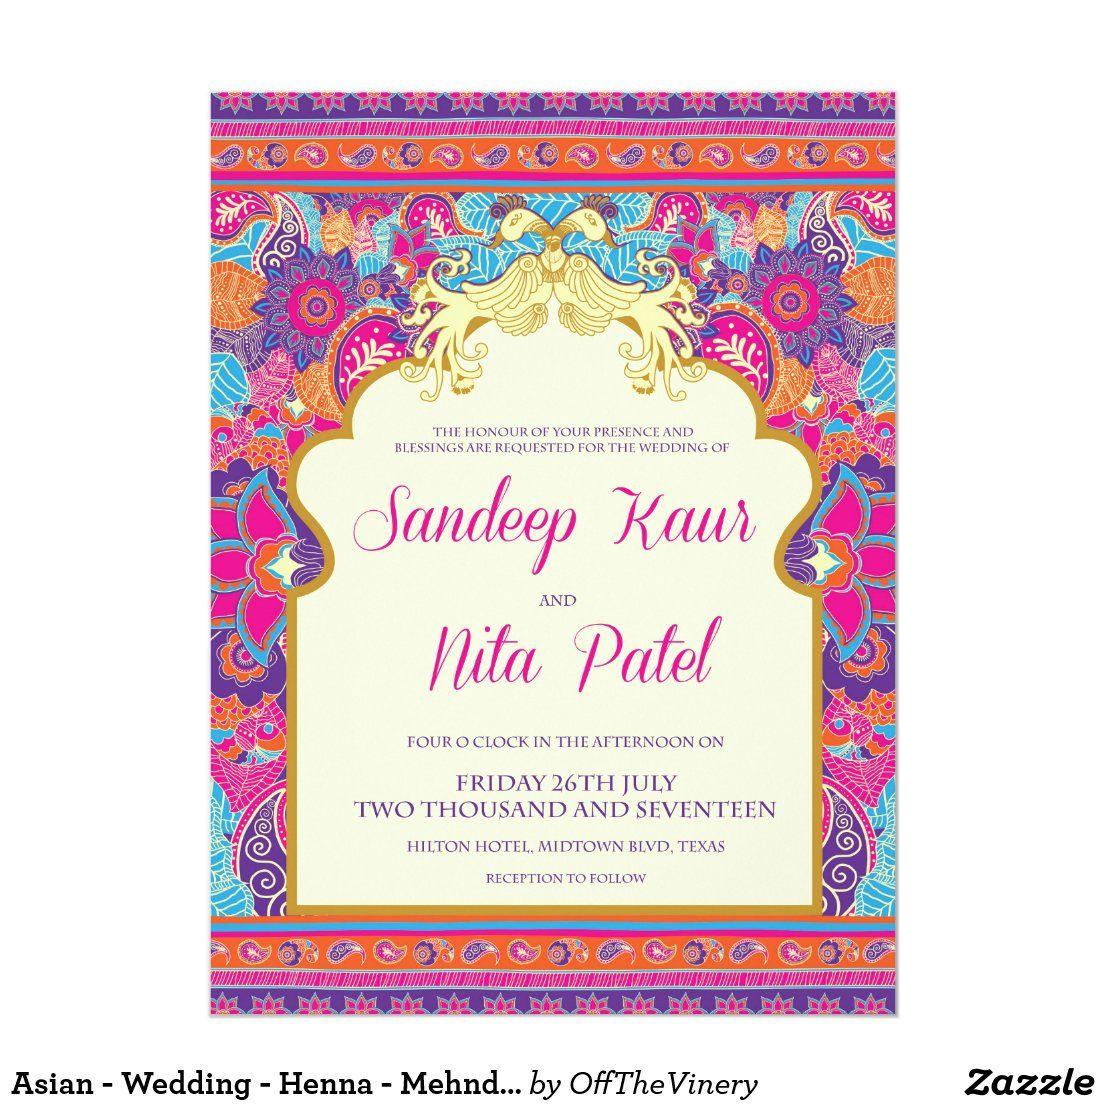 Asian Wedding Henna Mehndi Invitation Zazzle Com In 2021 Indian Wedding Invitation Cards Box Wedding Invitations Wedding Cards